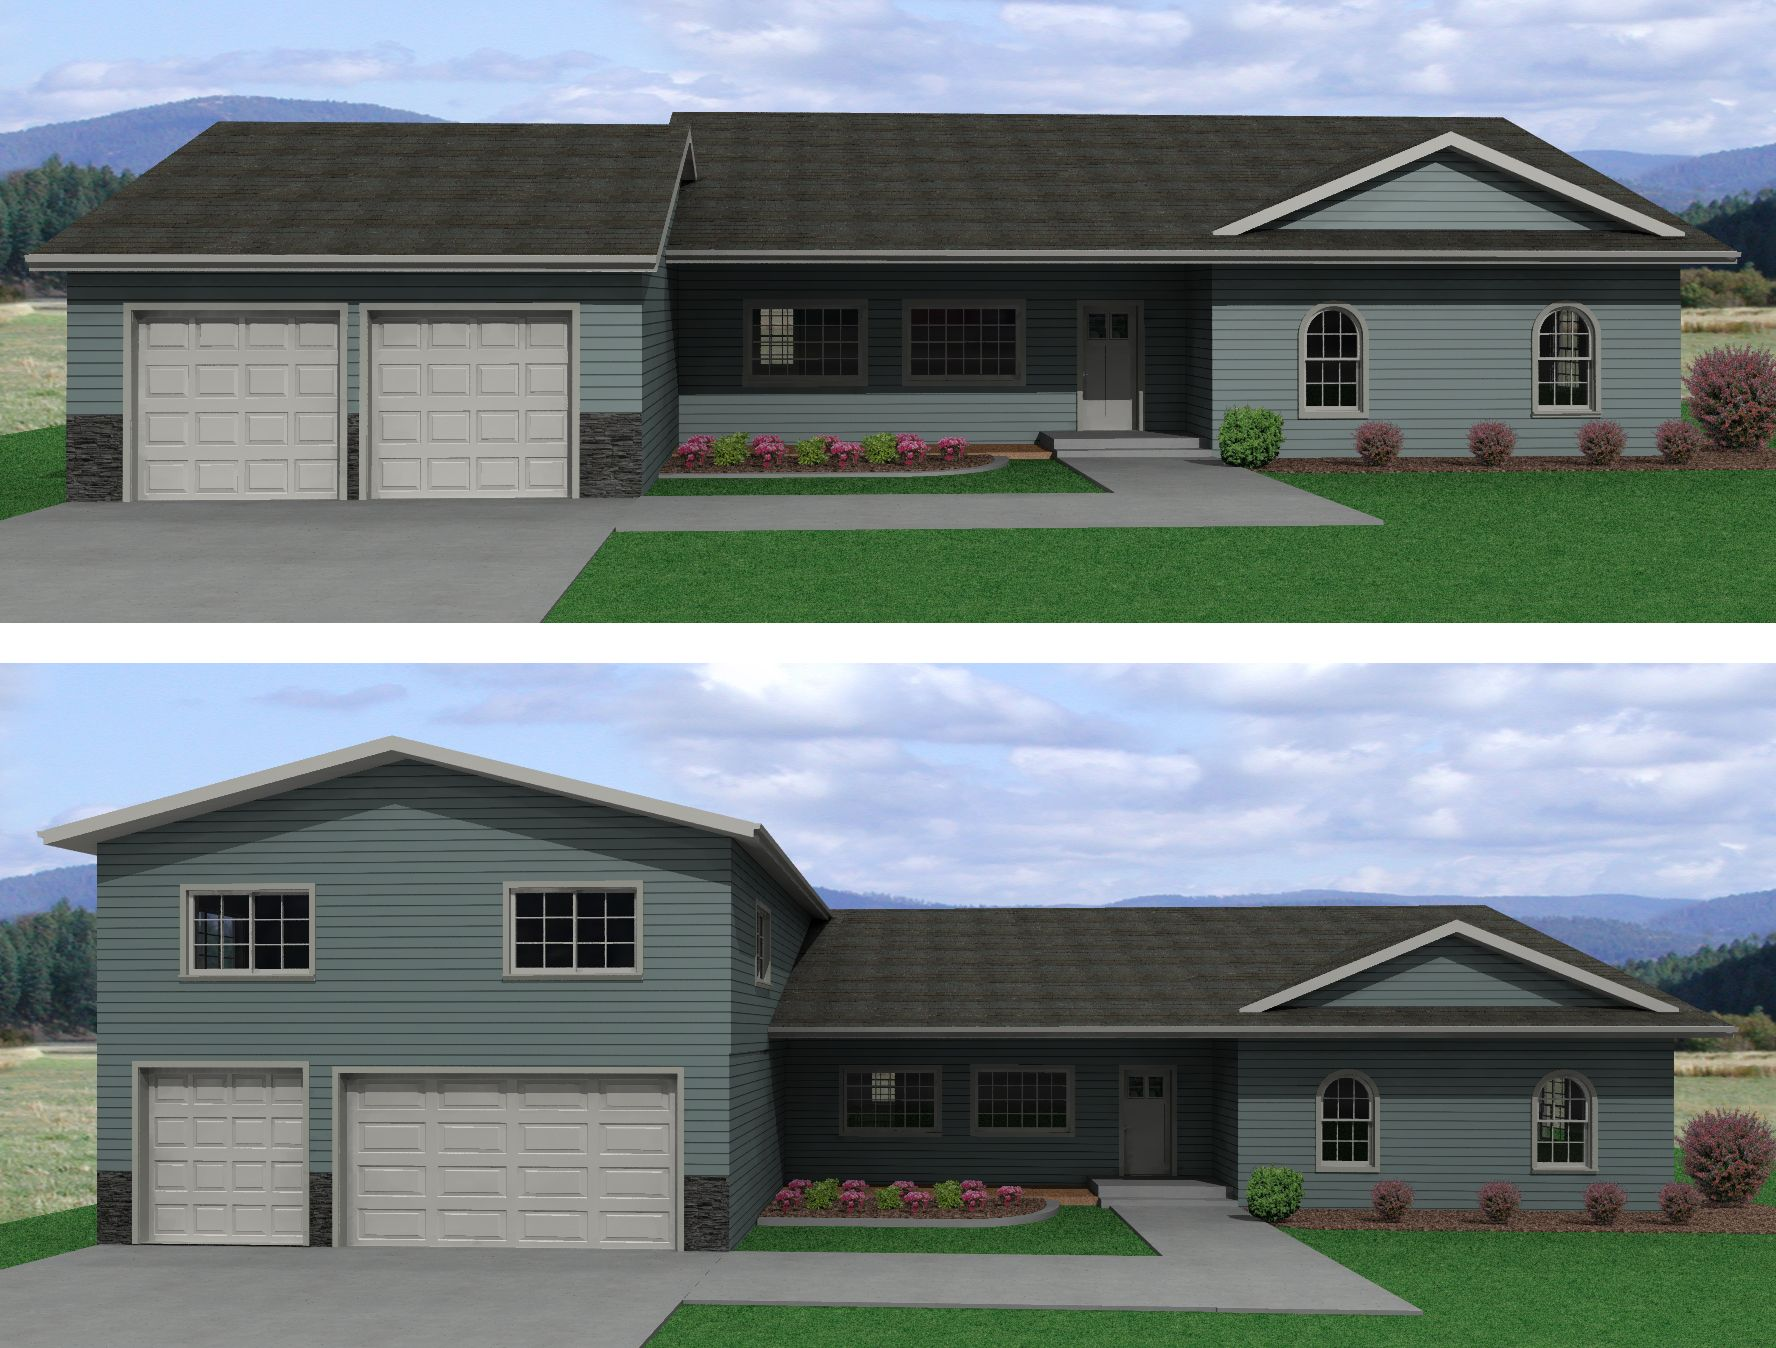 Image Result For Addition Over Garage Second Story Addition Exterior House Remodel Garage Addition